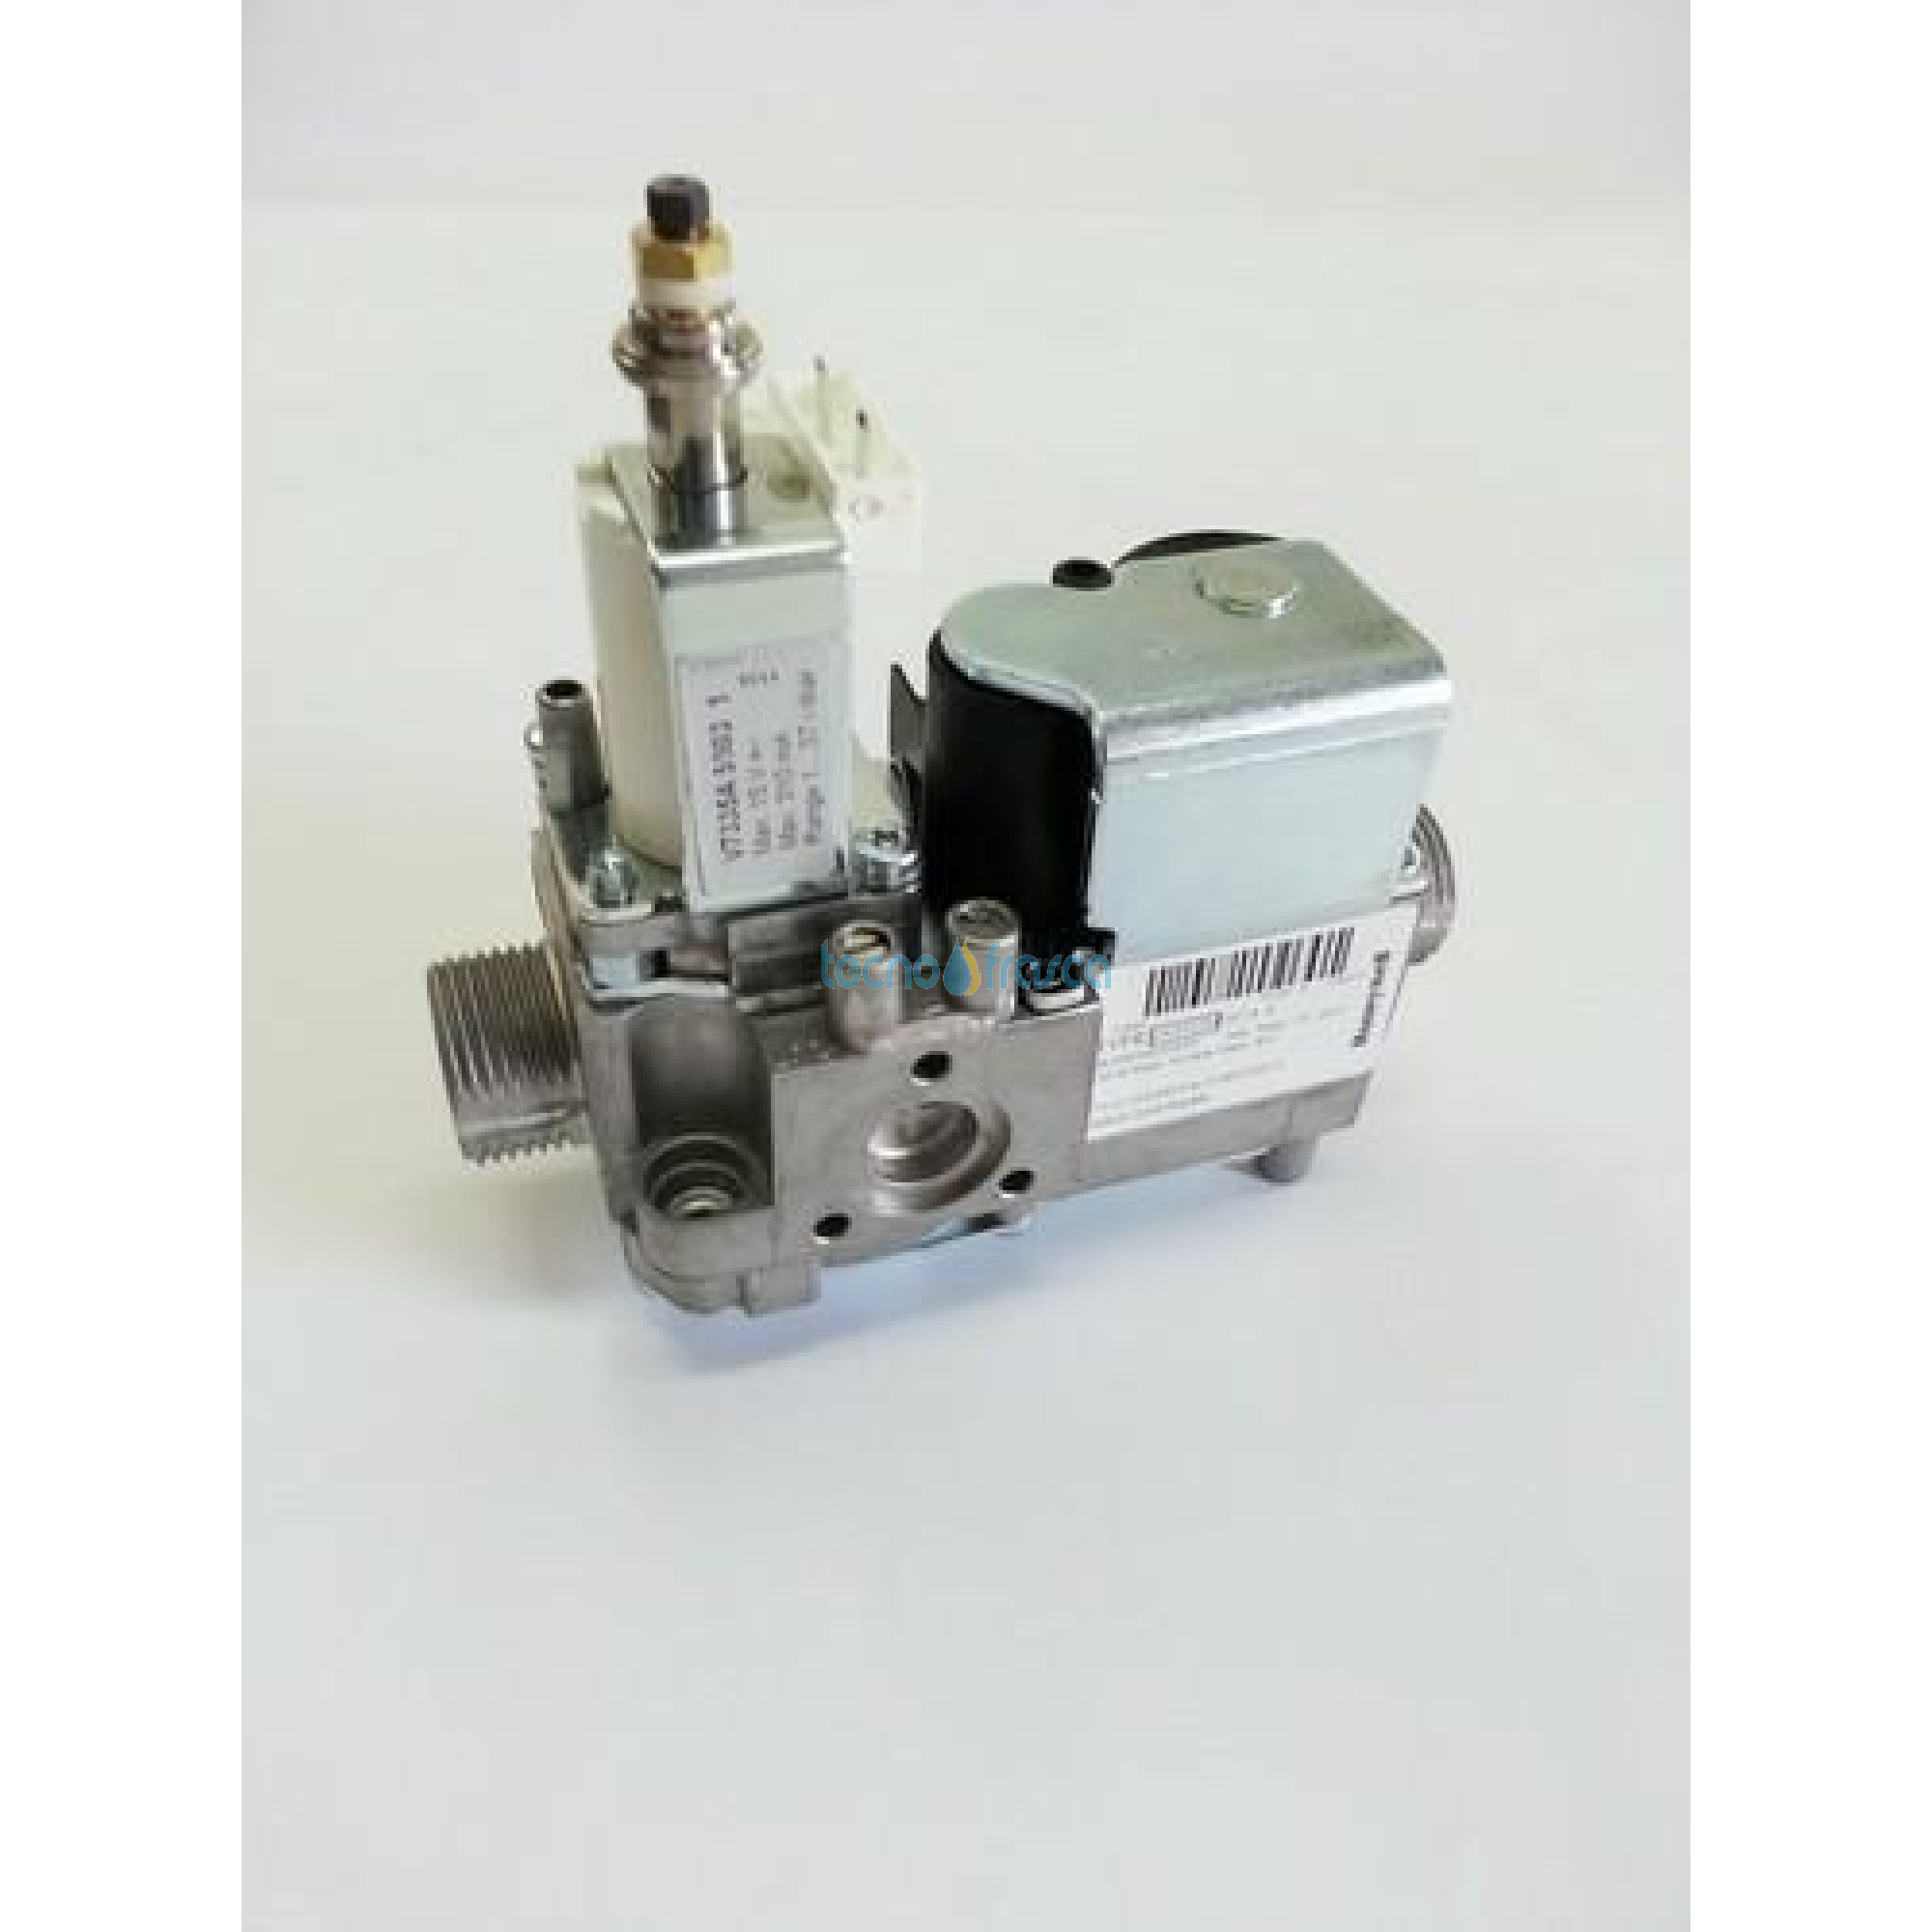 Valvola gas vk4105m5009b